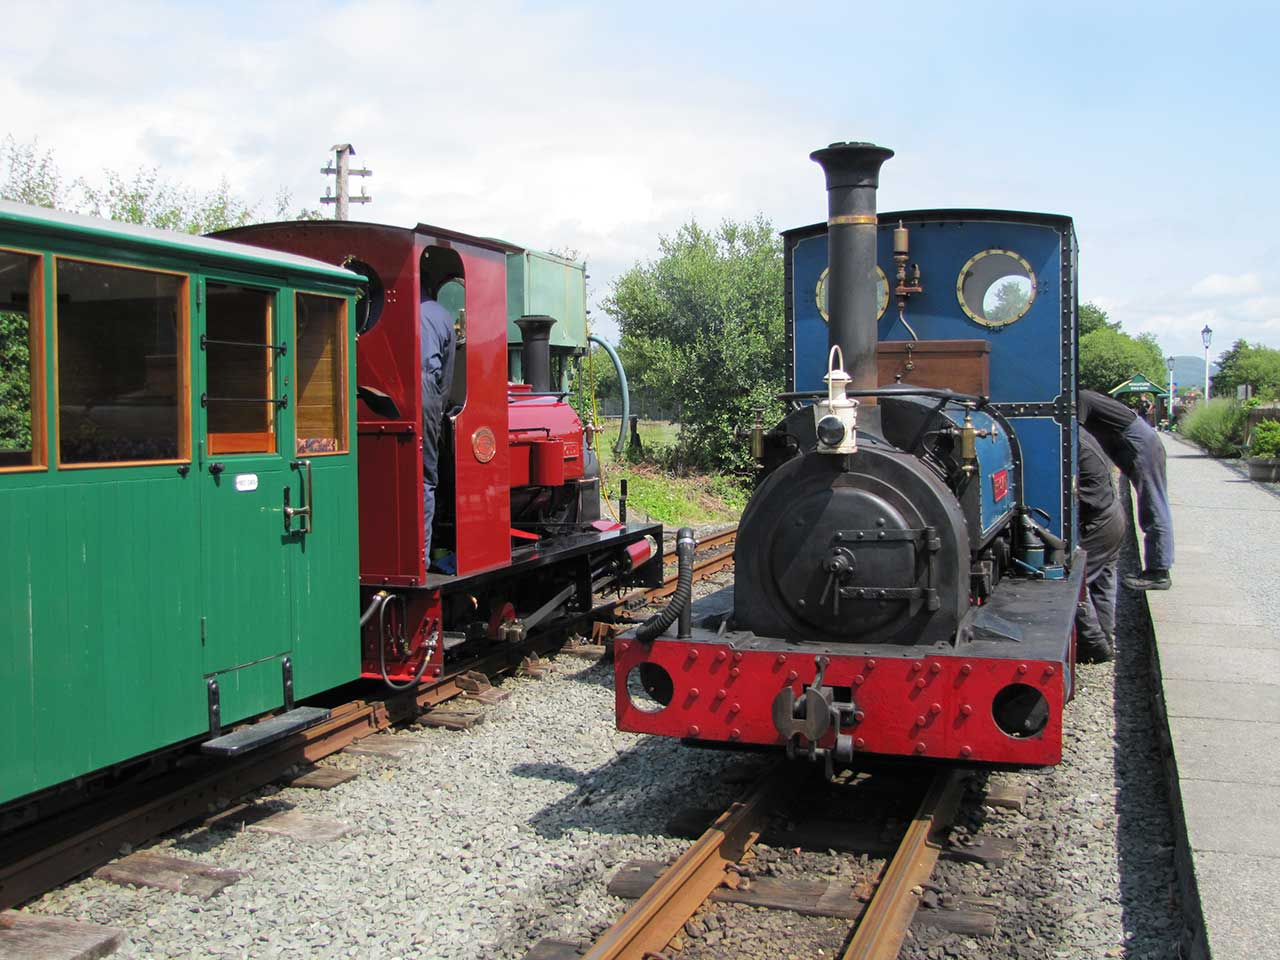 The Welsh Highland Heritage Railway - Photo © Mike Chapman